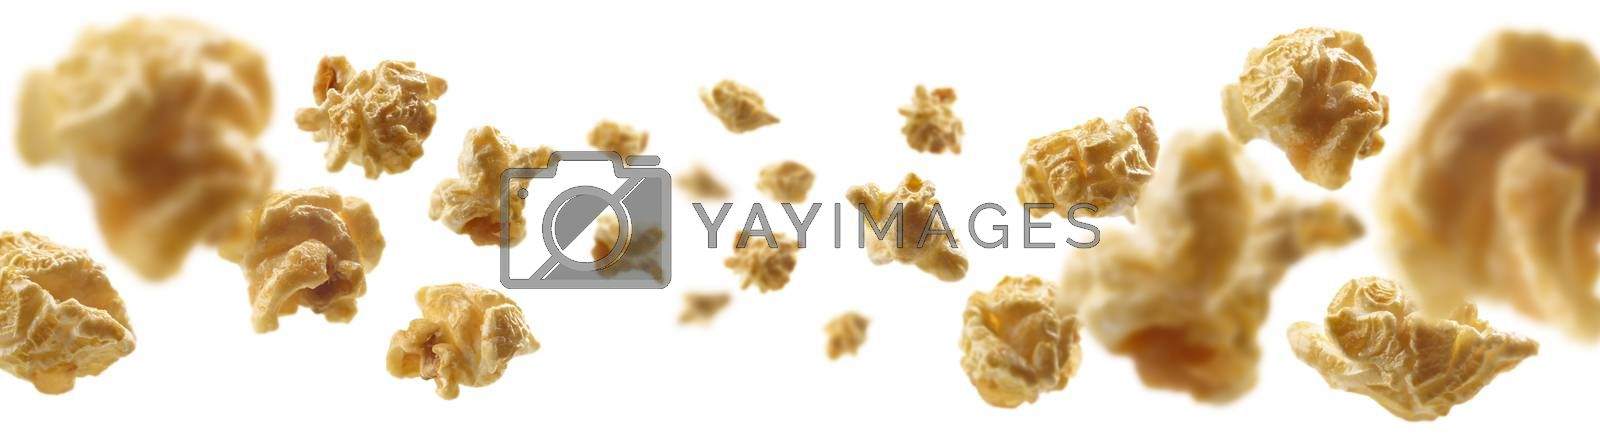 Caramel-flavored popcorn levitates on a white background.